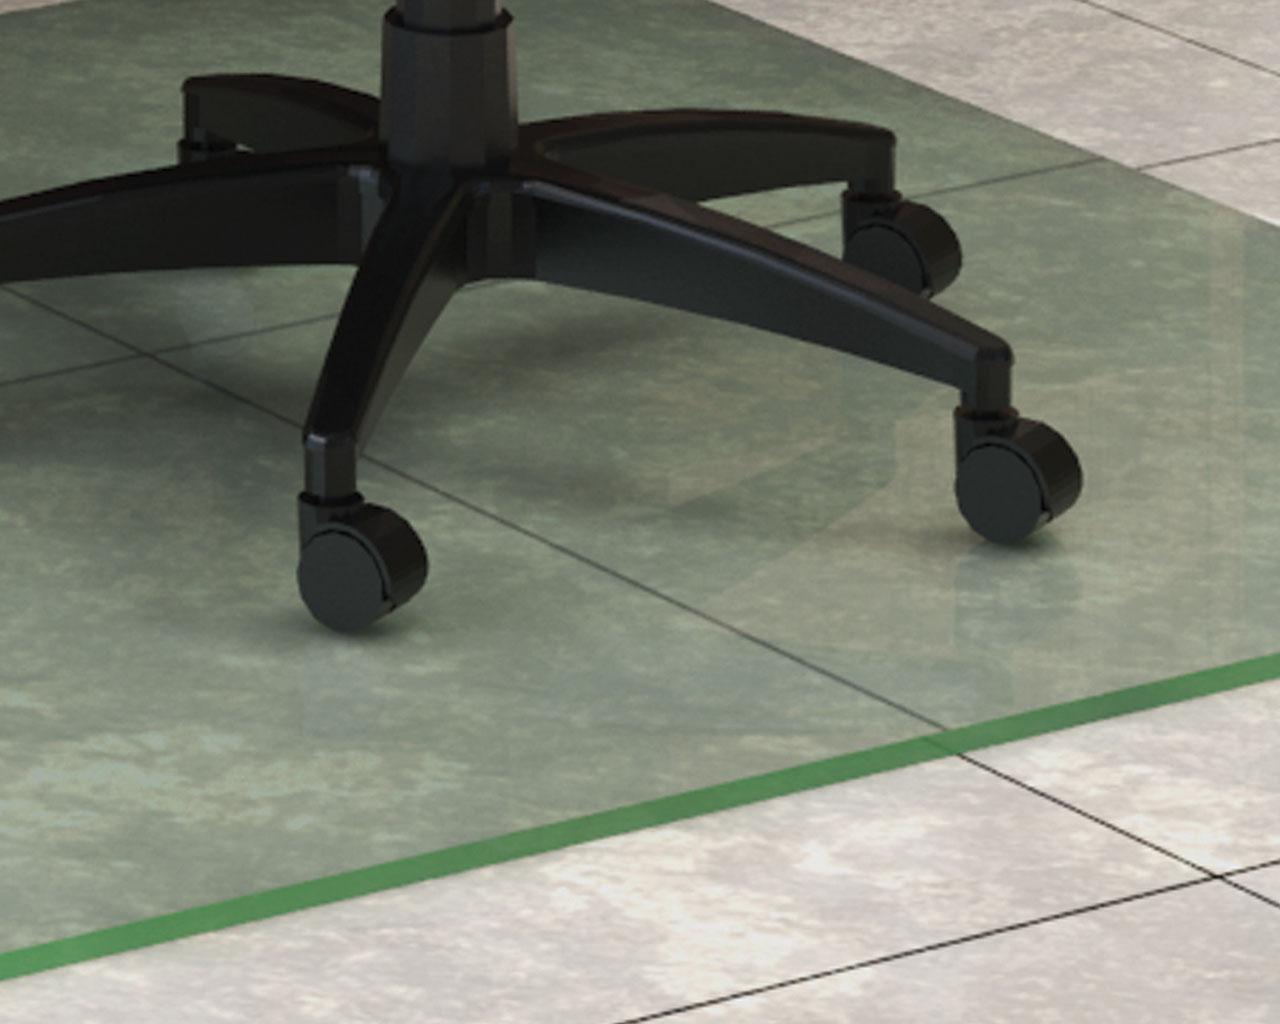 desk chair glass mat wheelchair repair kitchener chairmats for floors